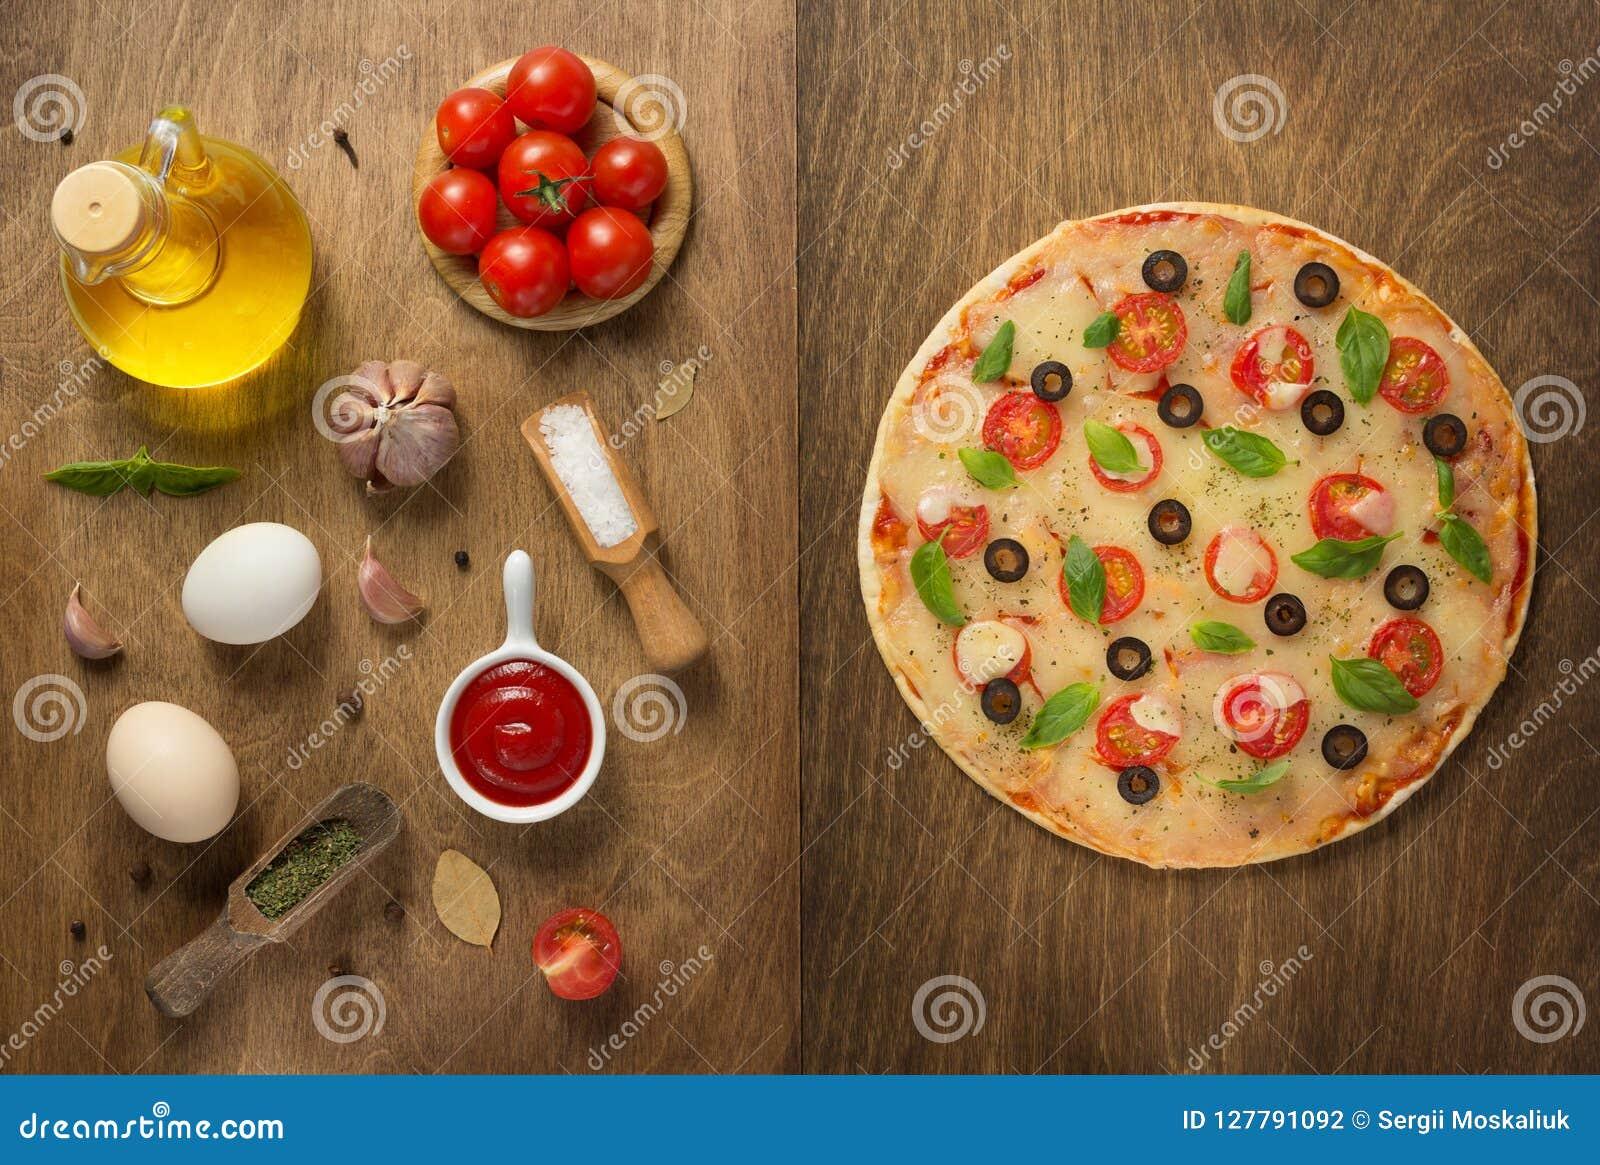 Margarita pizza and food ingredients